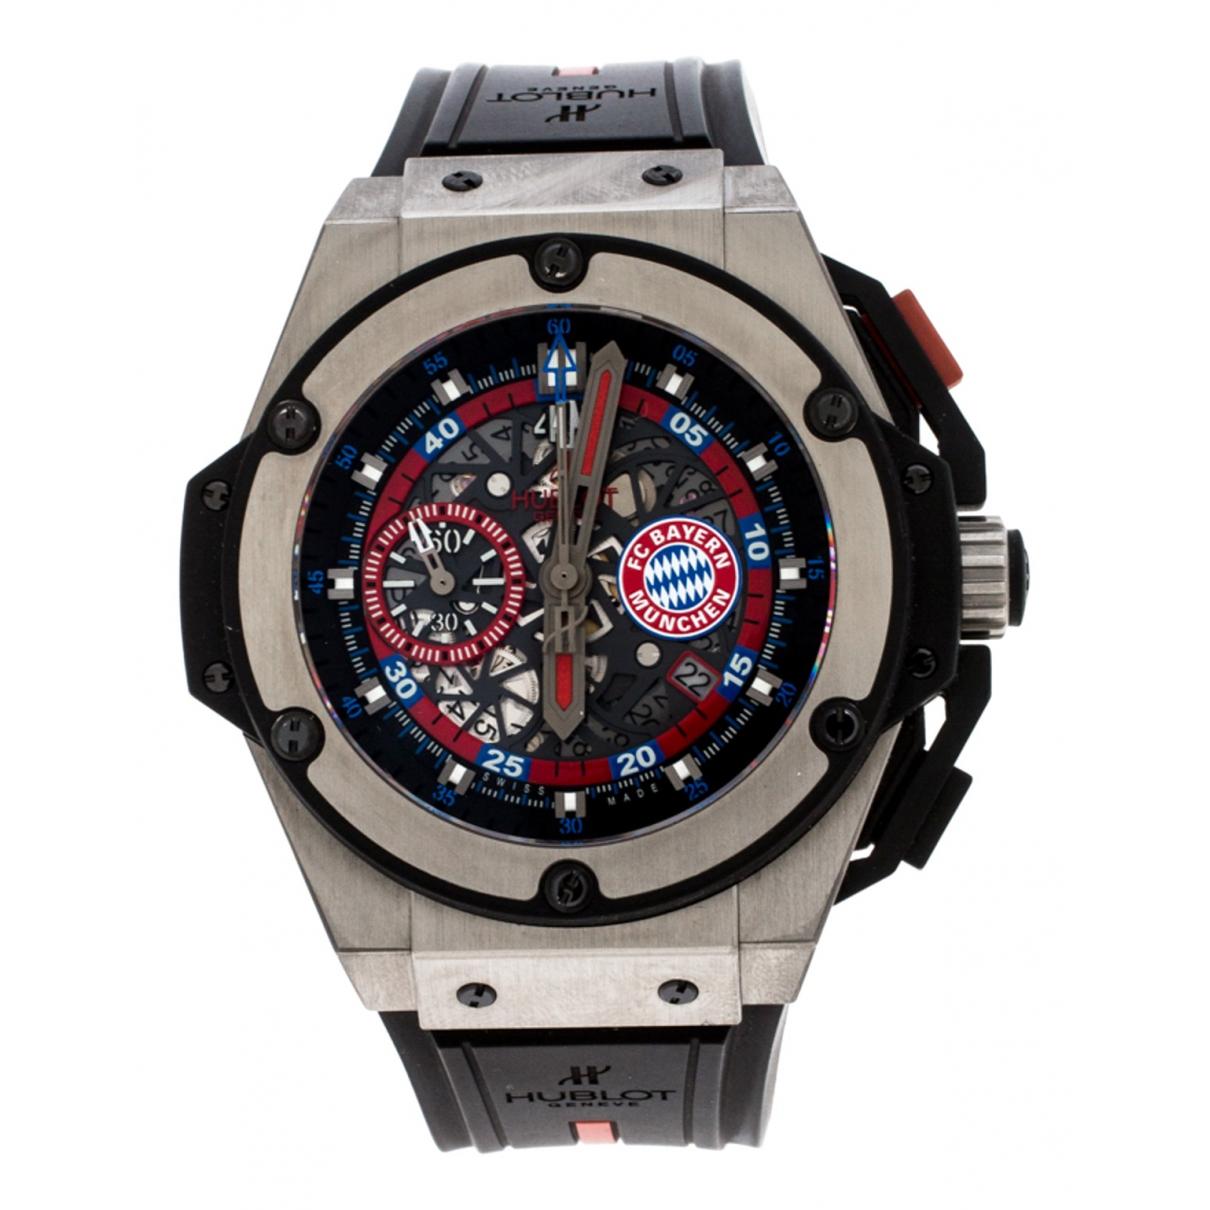 Hublot \N Black Titanium watch for Men \N